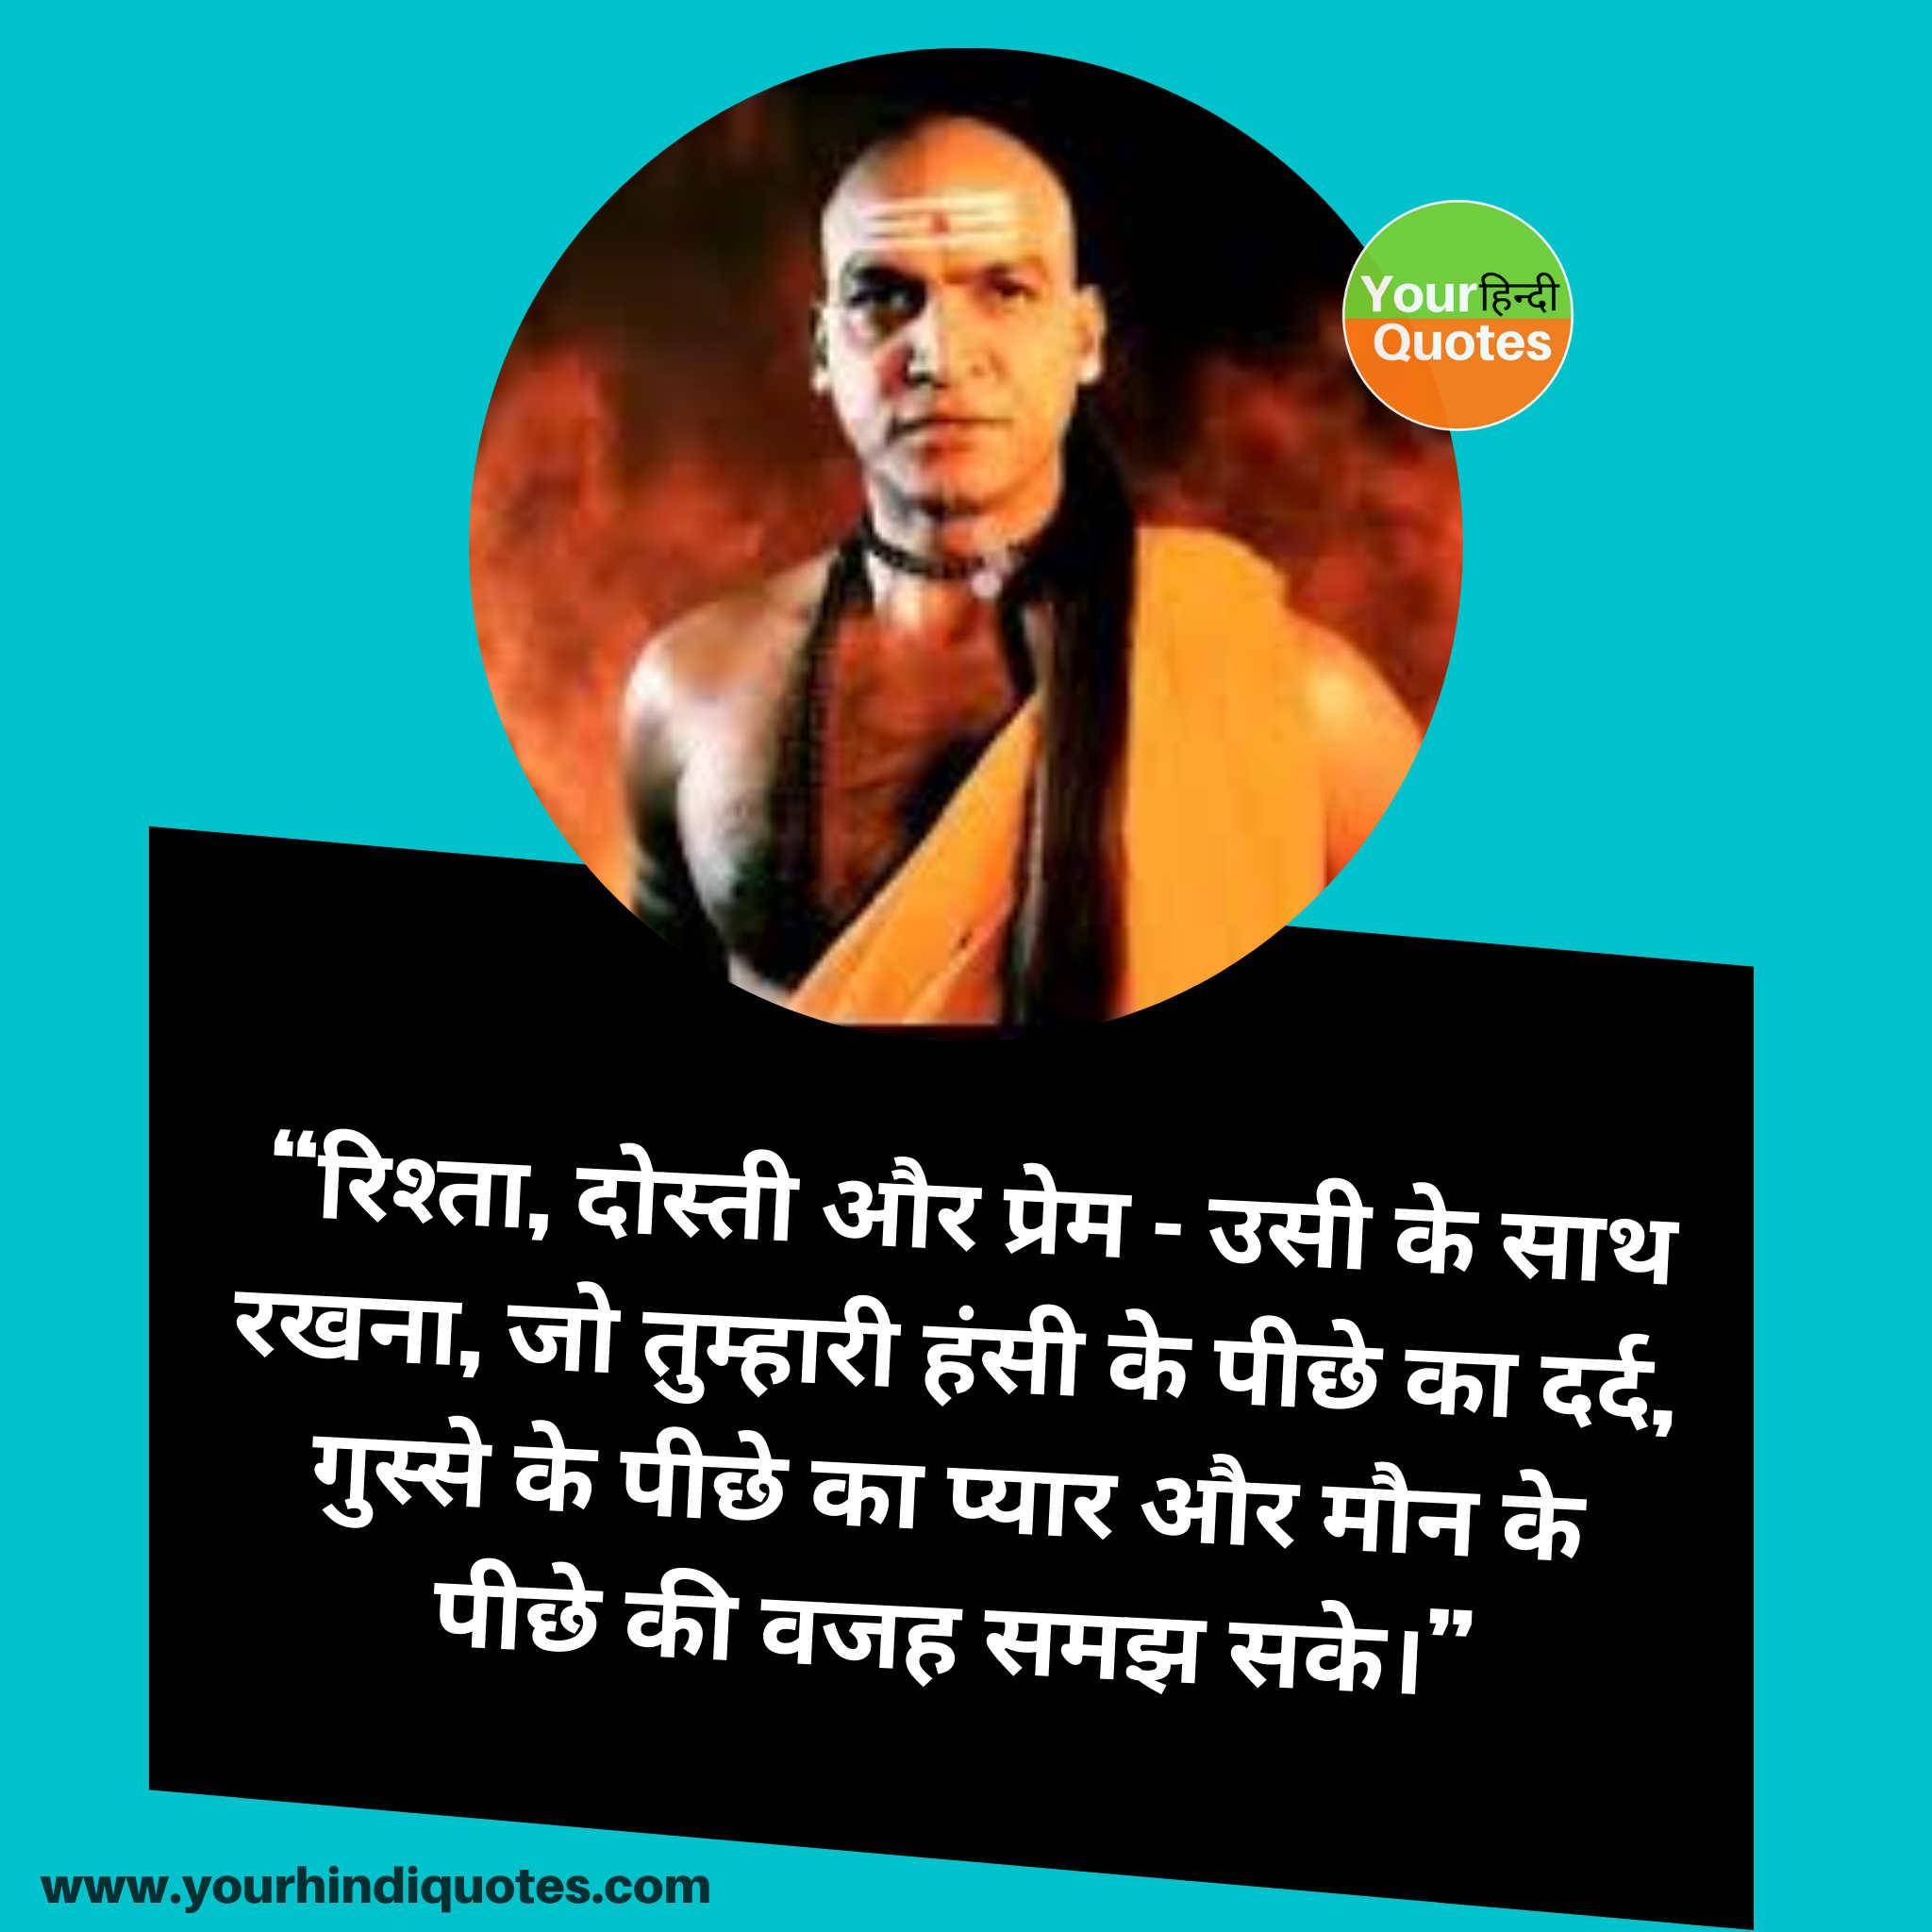 Chanakya Niti Quotes Picture